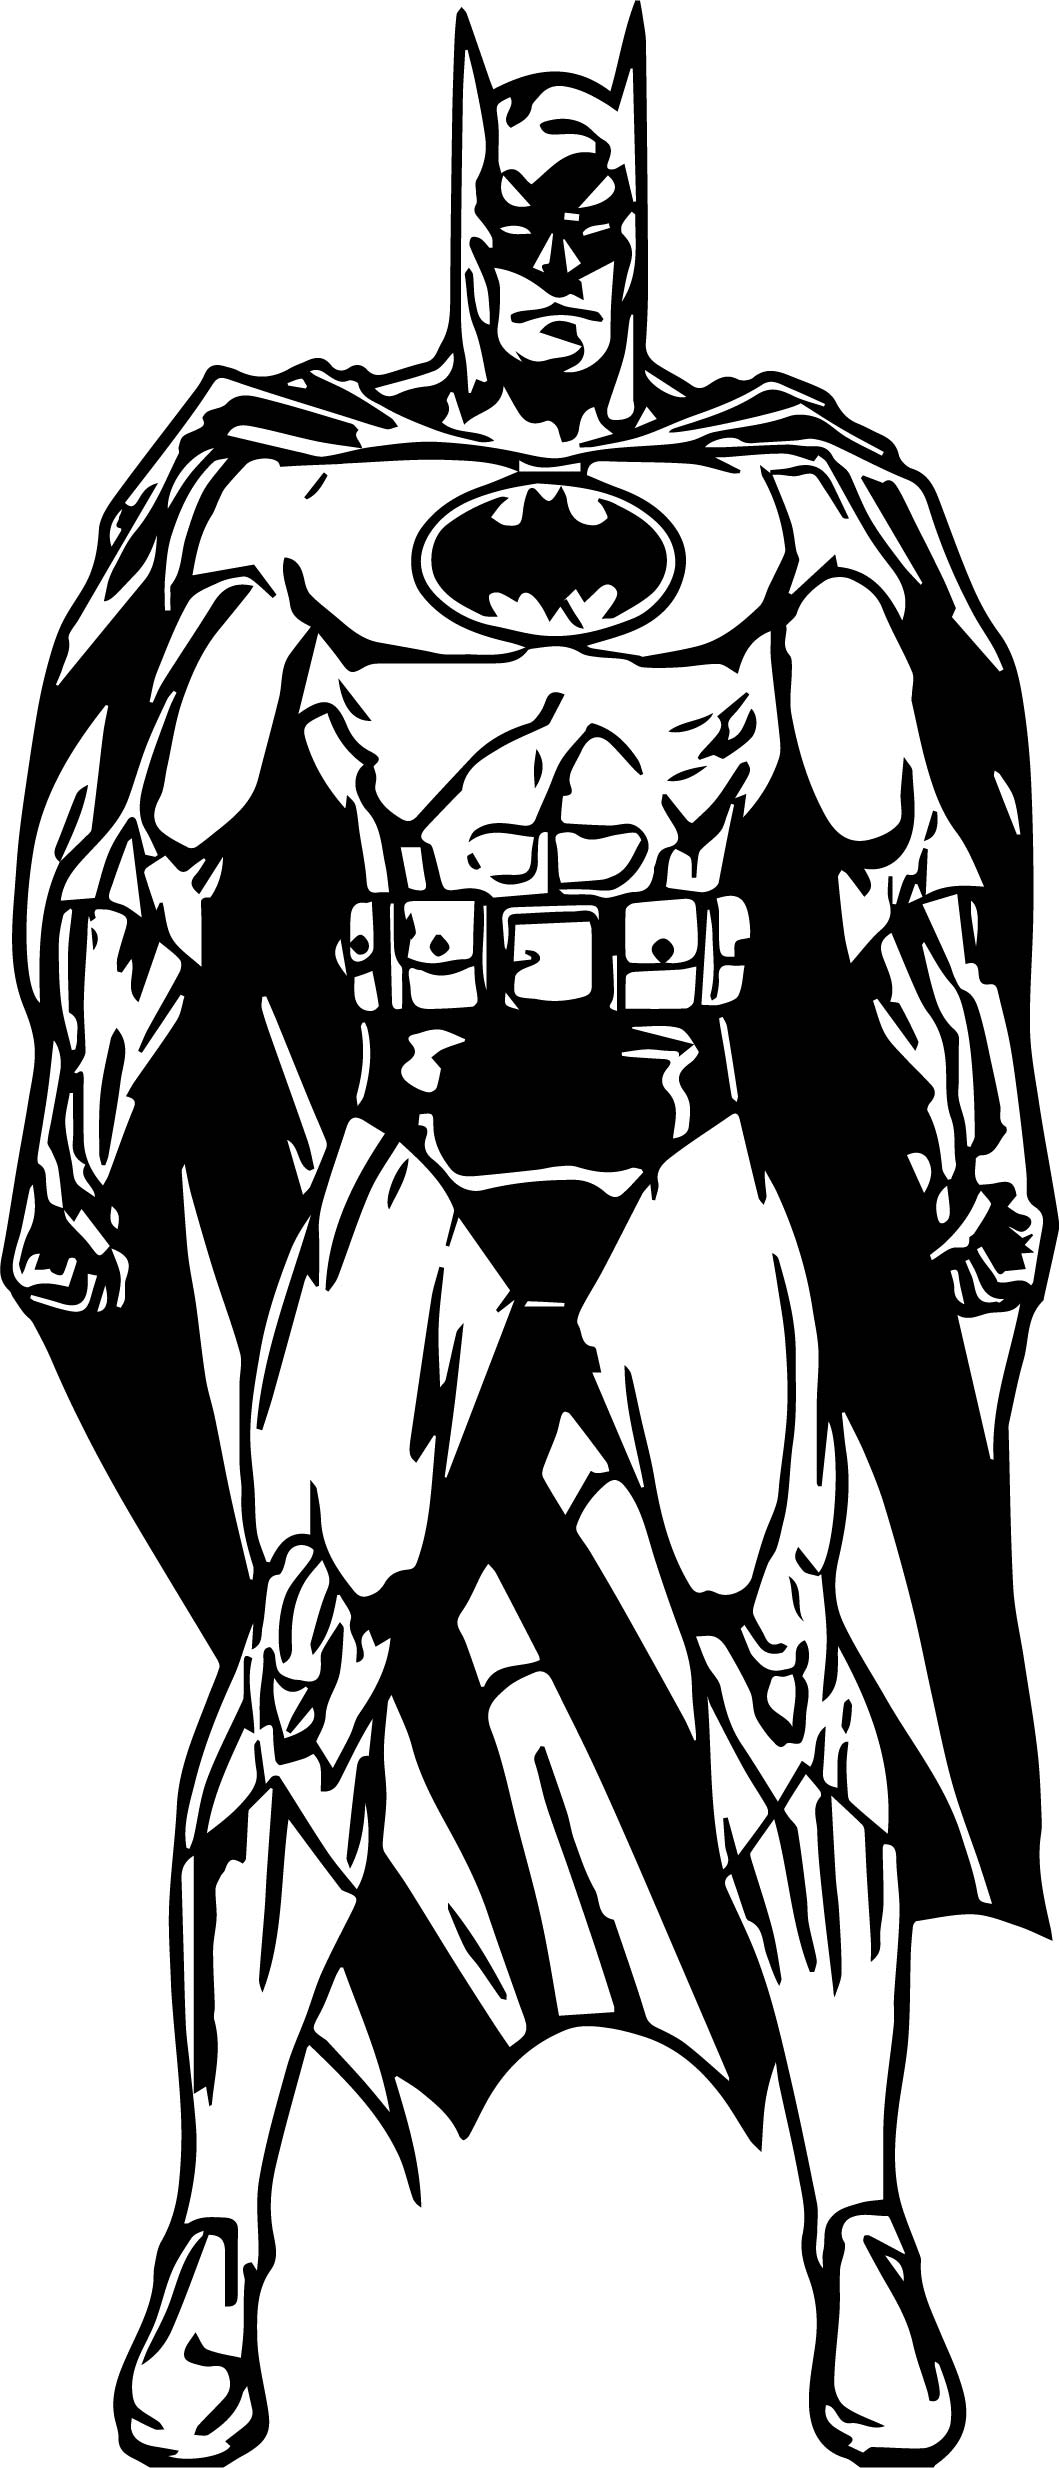 Batman Cartoon Style Coloring Page